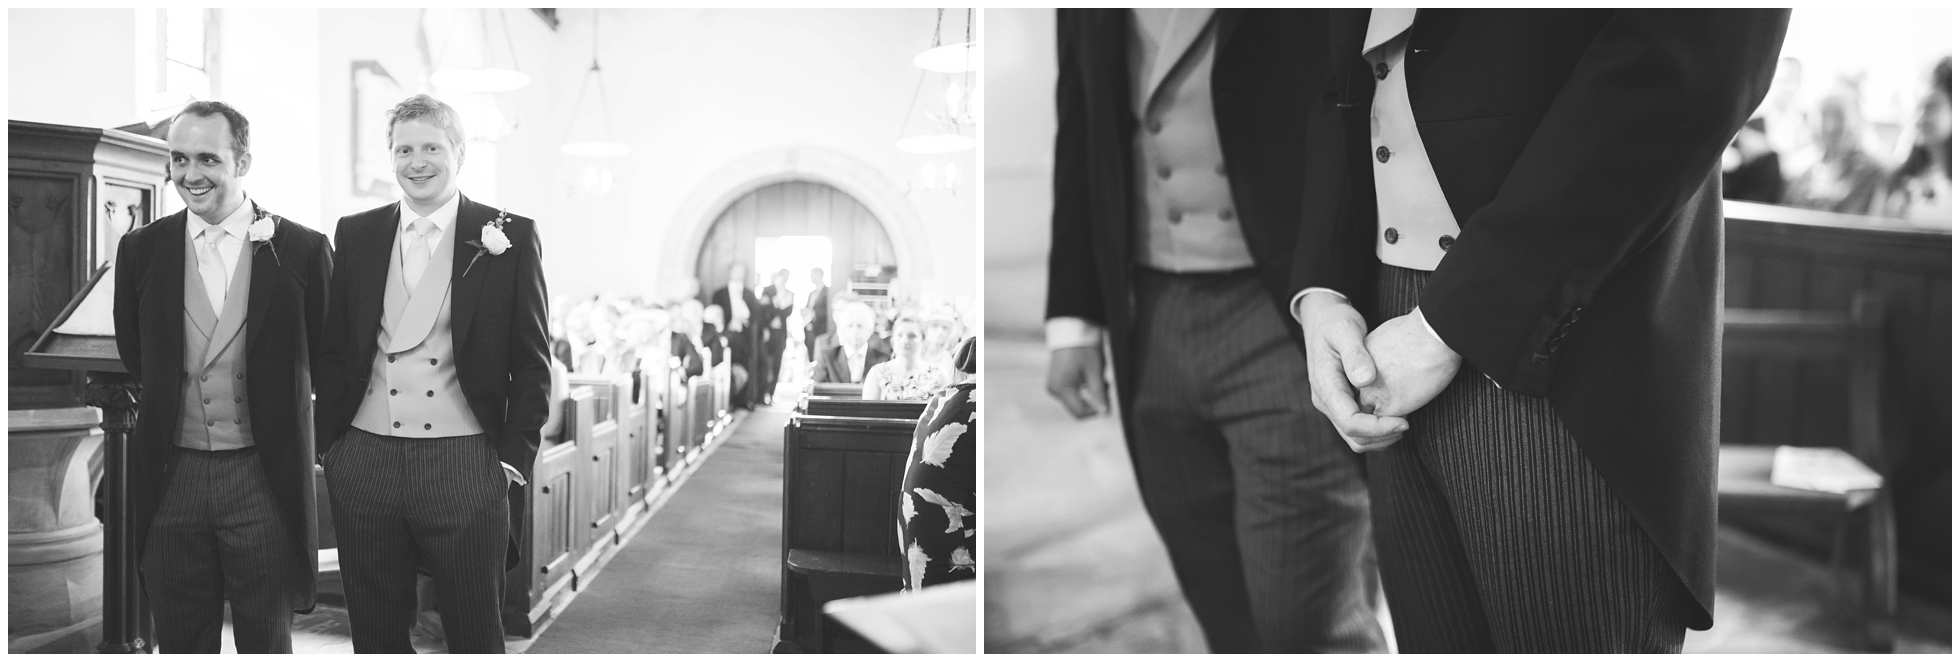 The groom at Ranby church